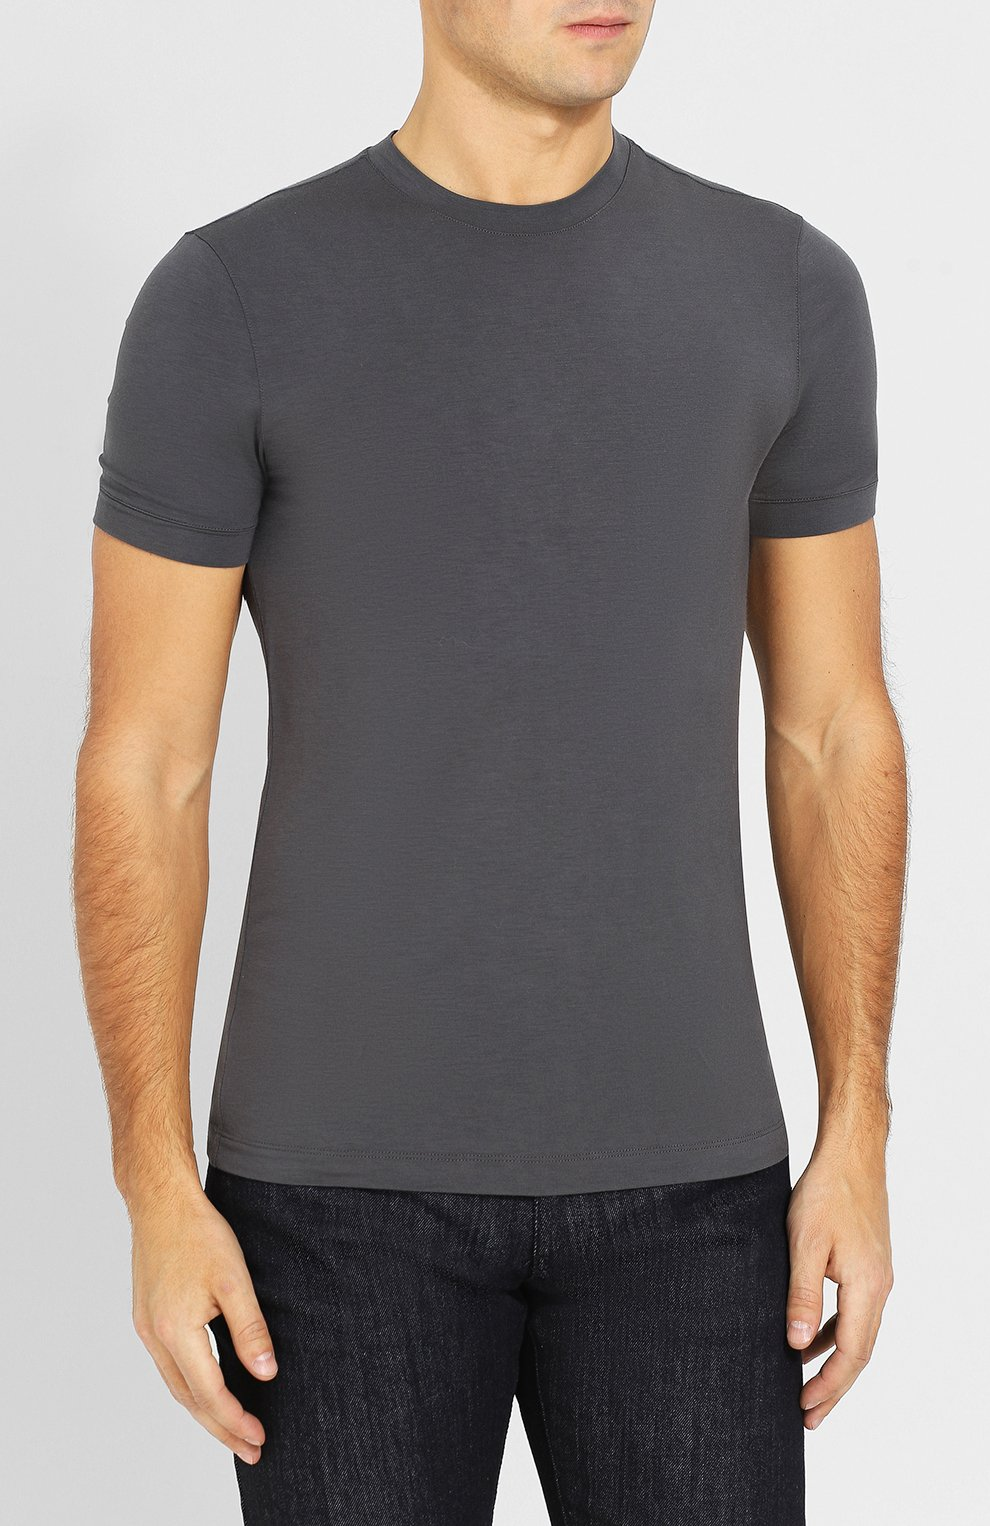 Мужская однотонная футболка из вискозы GIORGIO ARMANI серого цвета, арт. 8NST52/SJP4Z | Фото 3